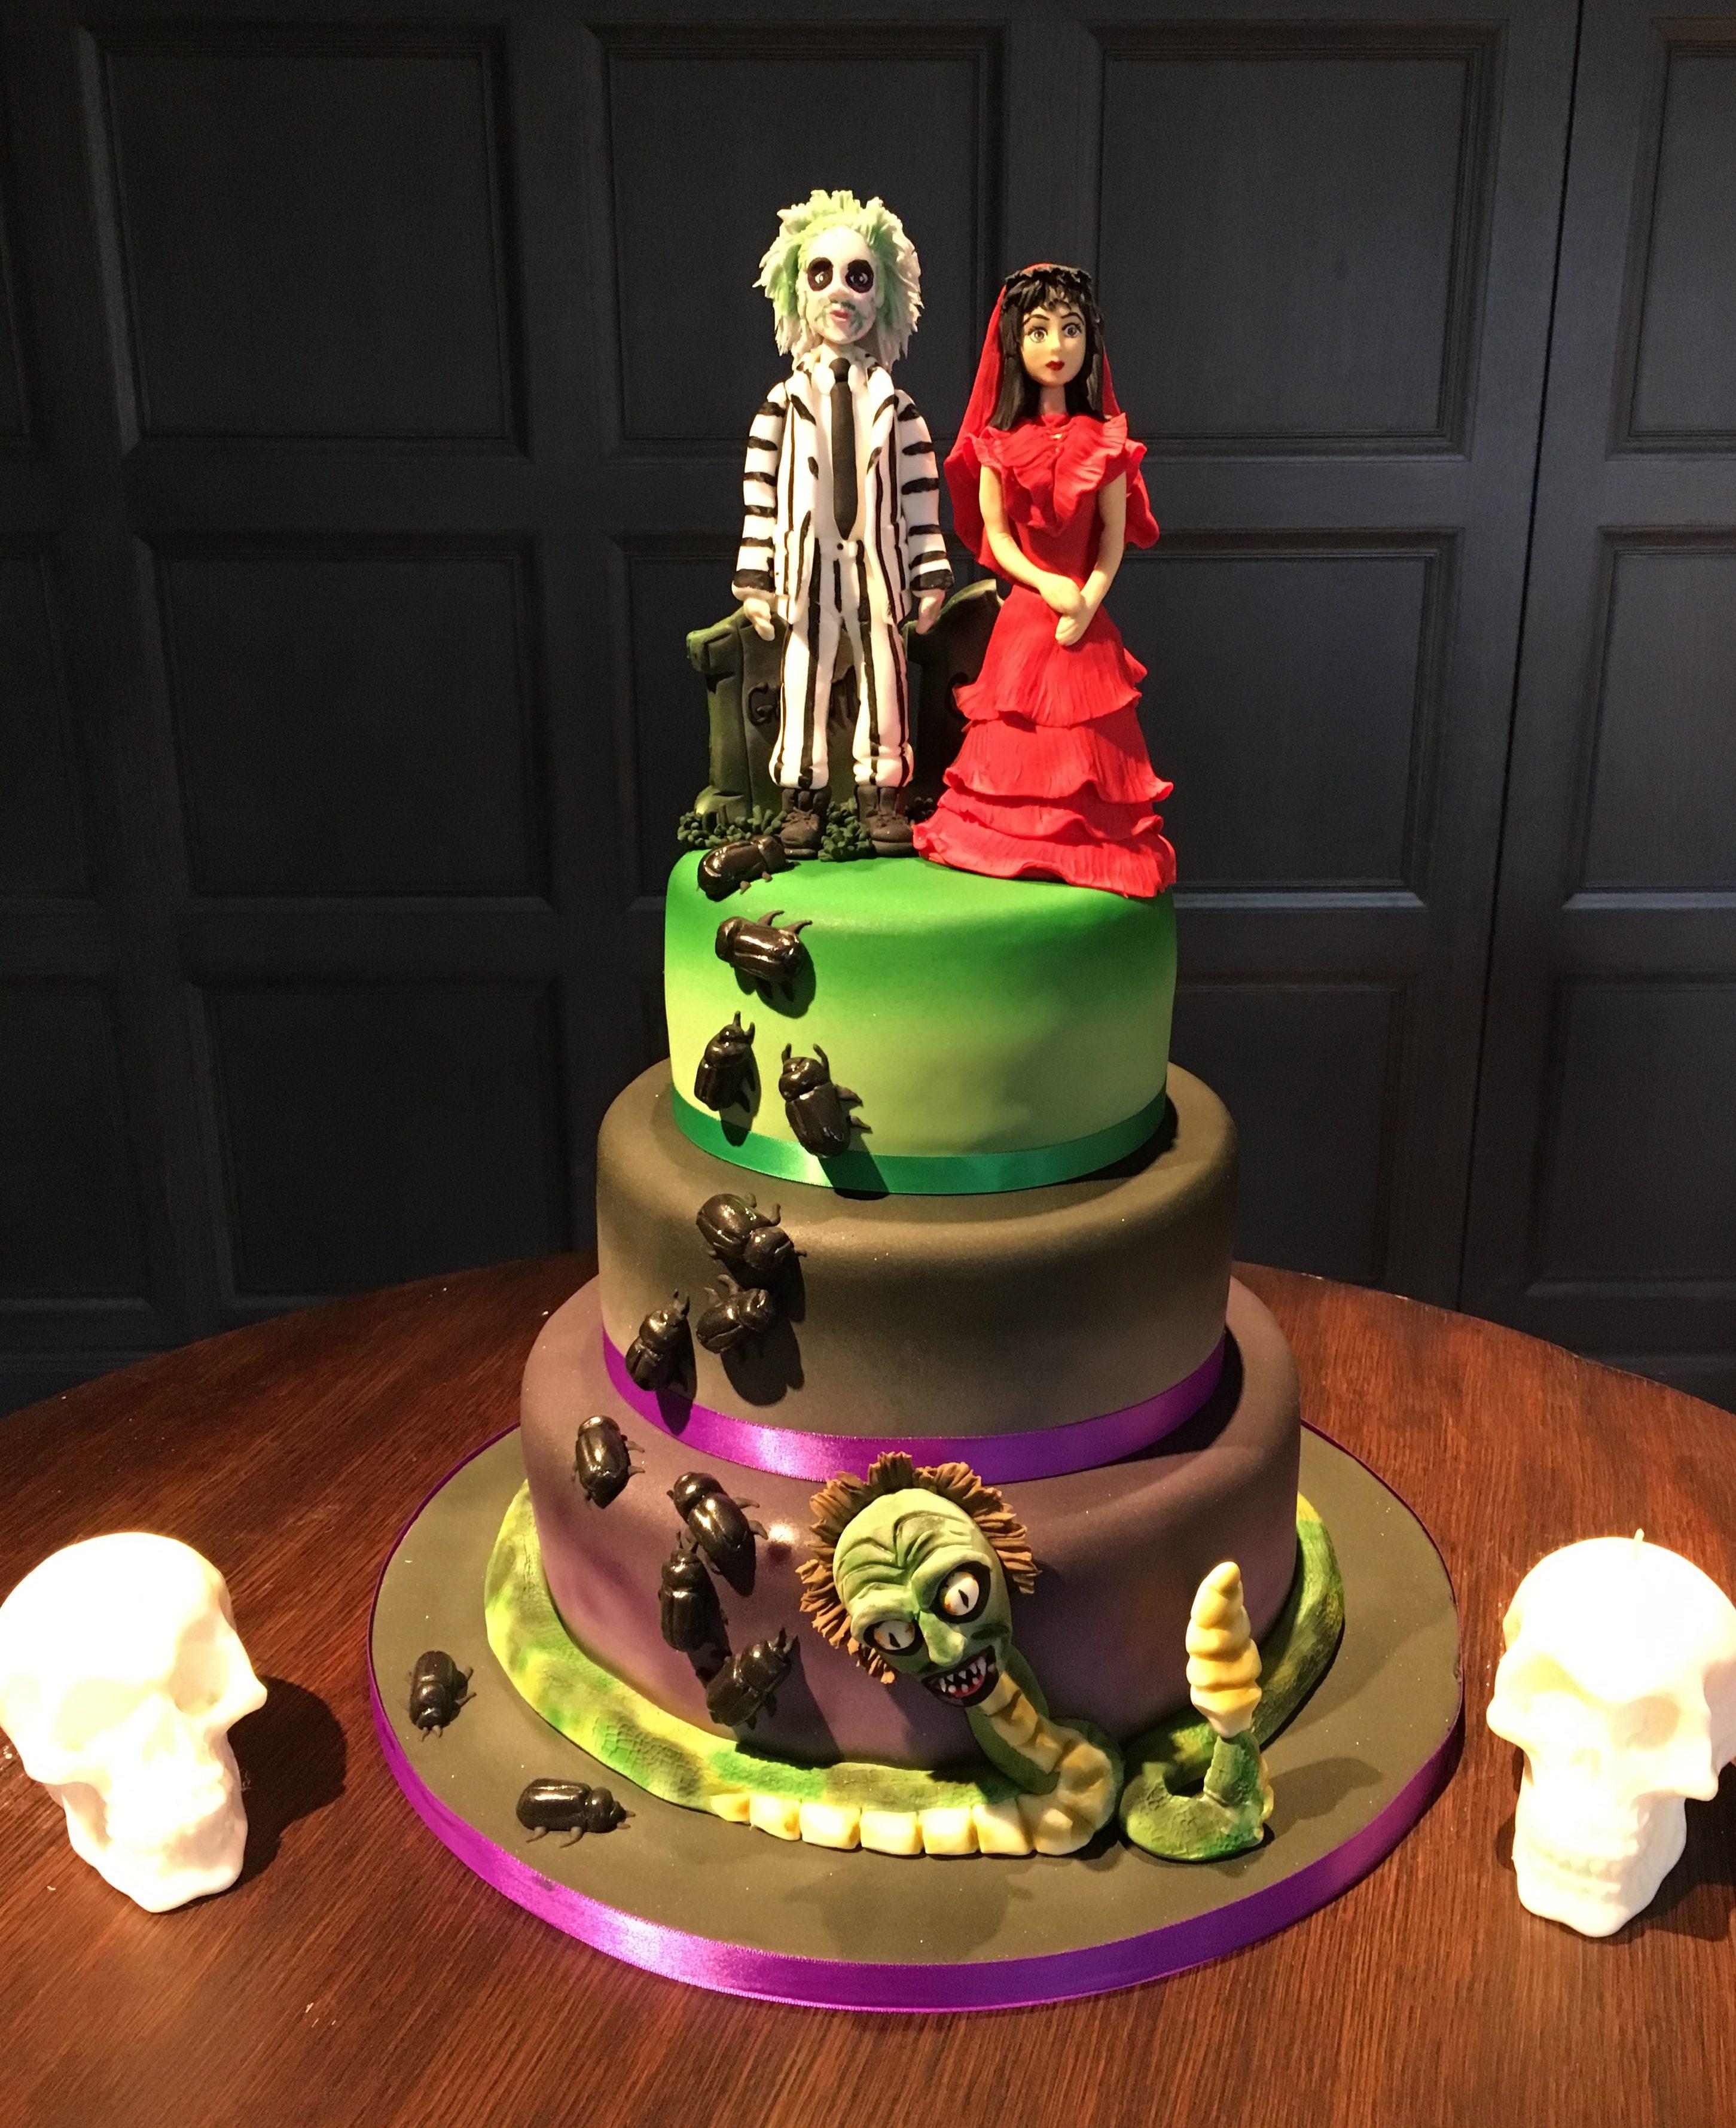 Beetle Wedding Cake Designer Cakes By Paige